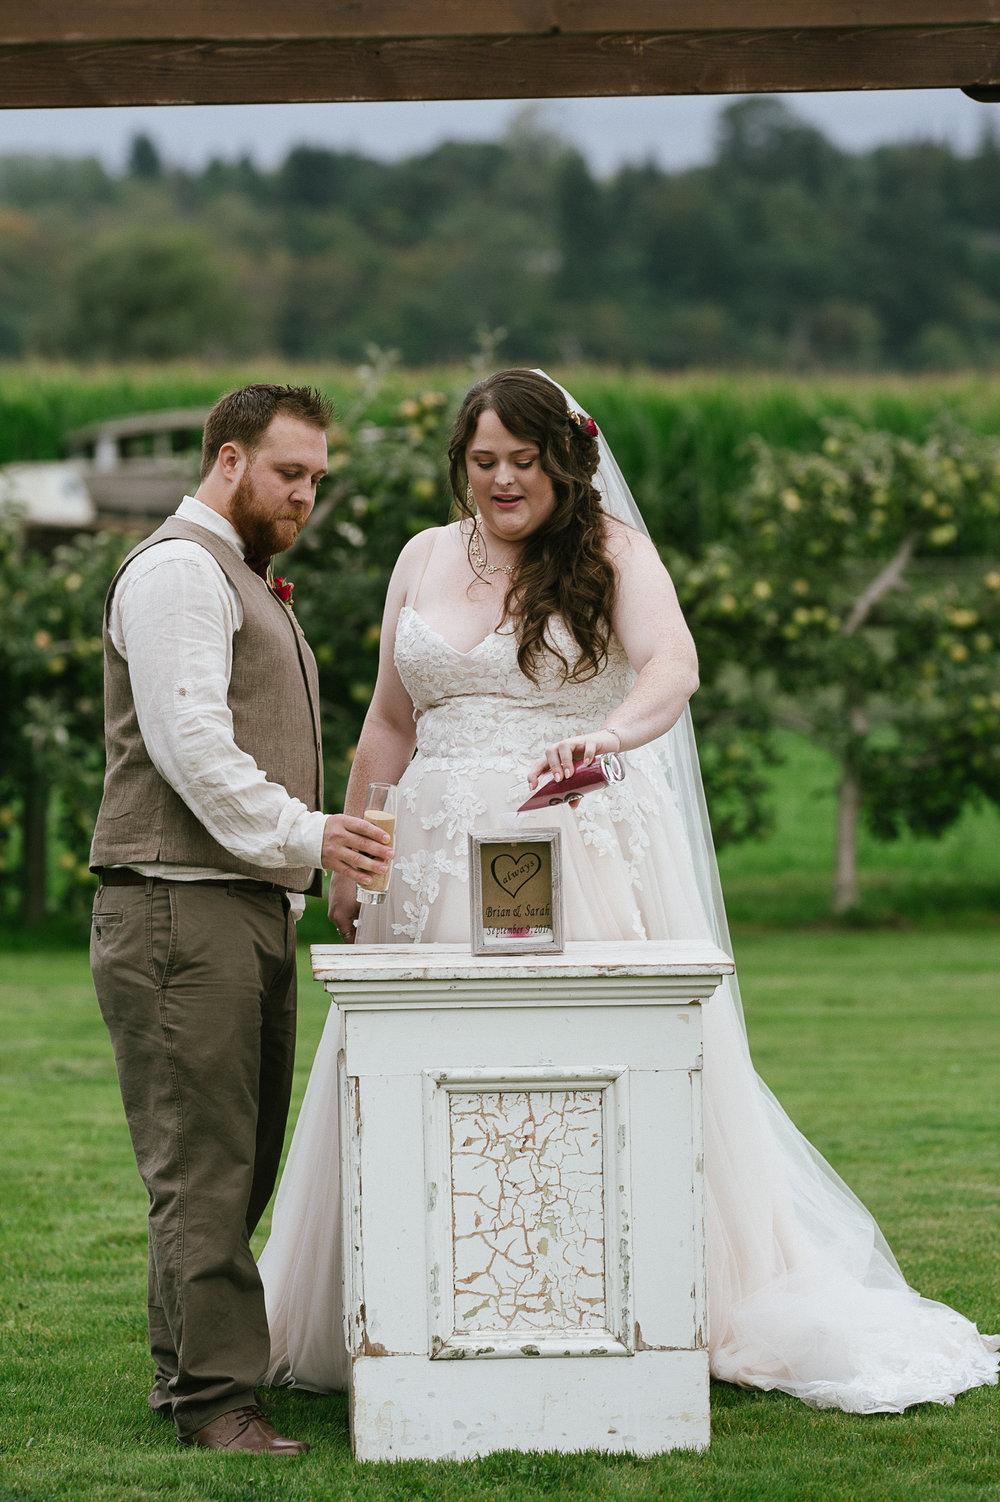 Swan Trail Farm Wedding_Sarah Schurman + Brian Skadan_Snohomish Wedding_Kelsey Lane Photography-6110.jpg